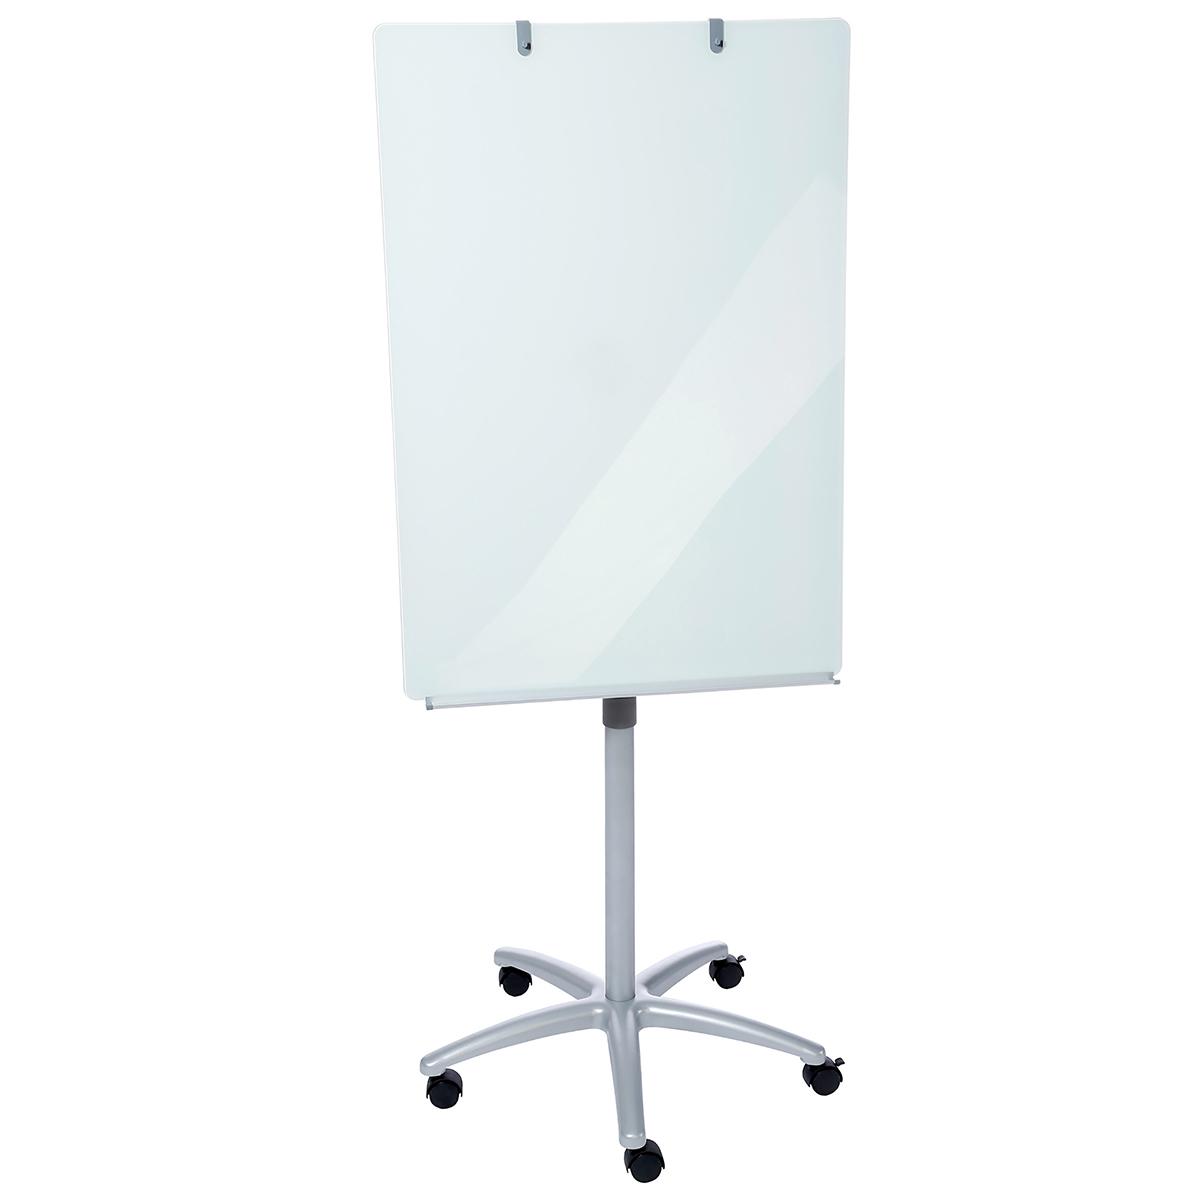 Dahle Glass Flip Chart Easel 70x100cm